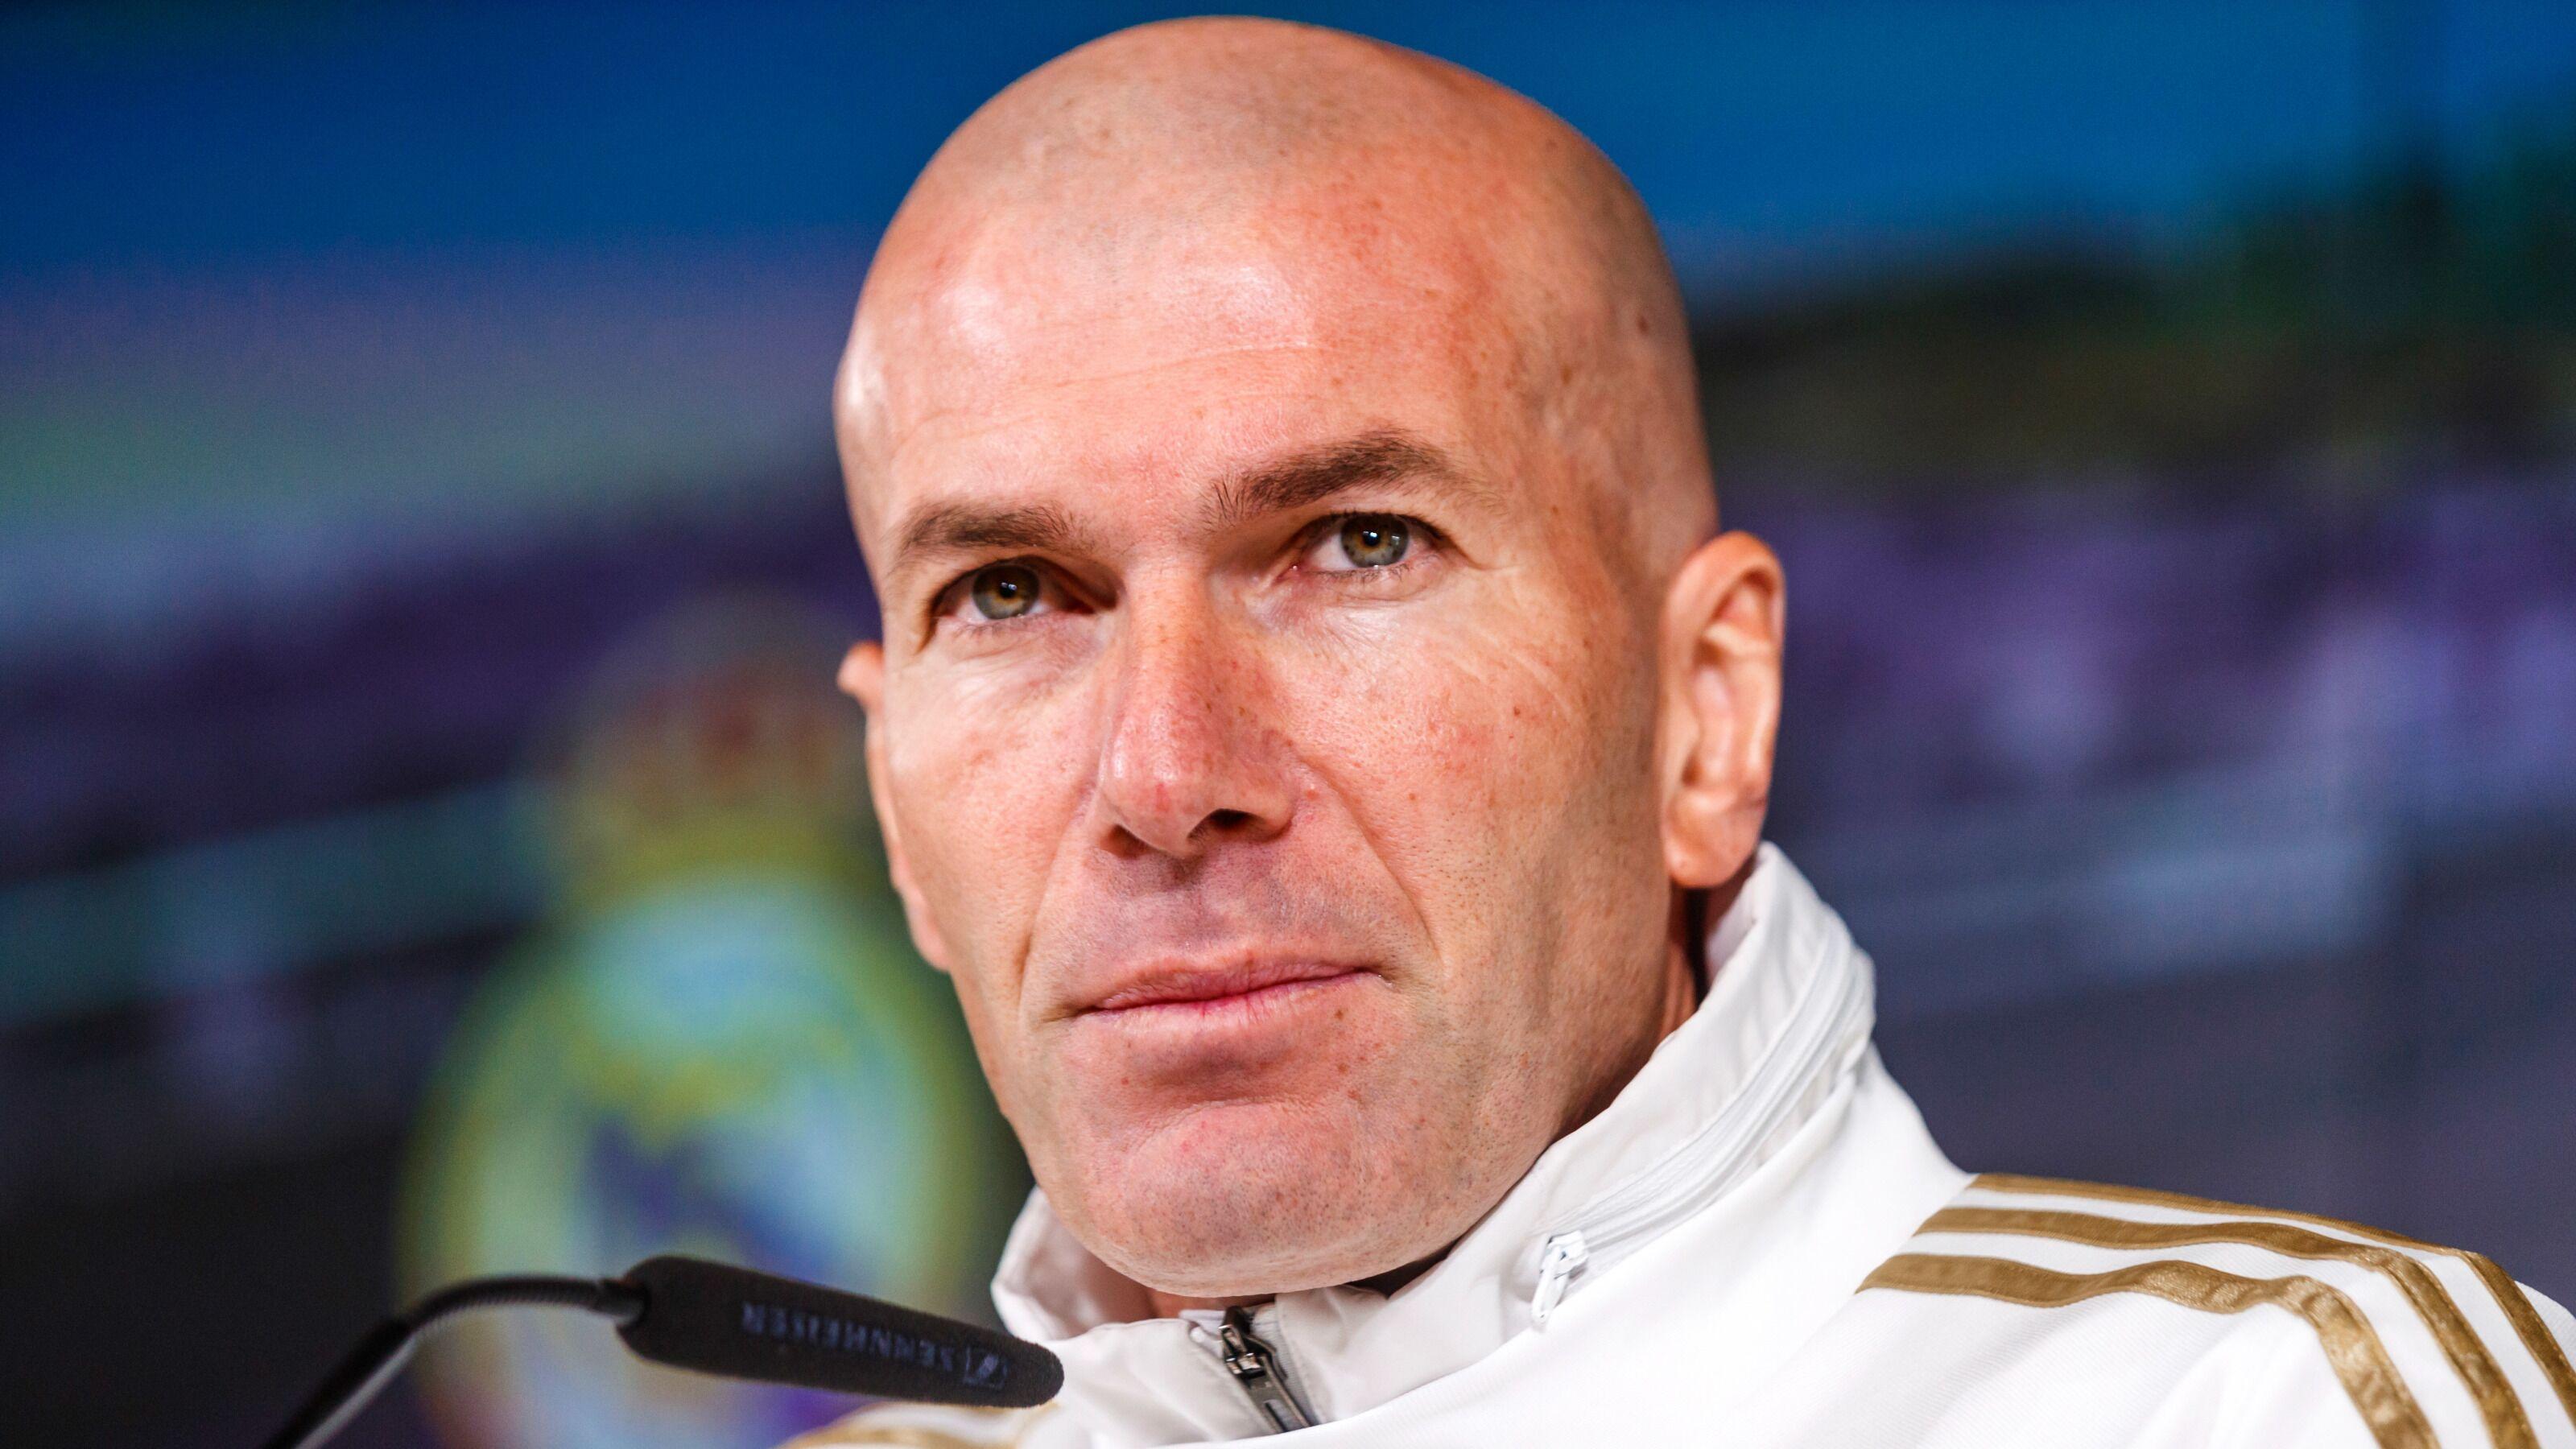 Real Madrid: Zinedine Zidane is unsurprisingly France's dream target